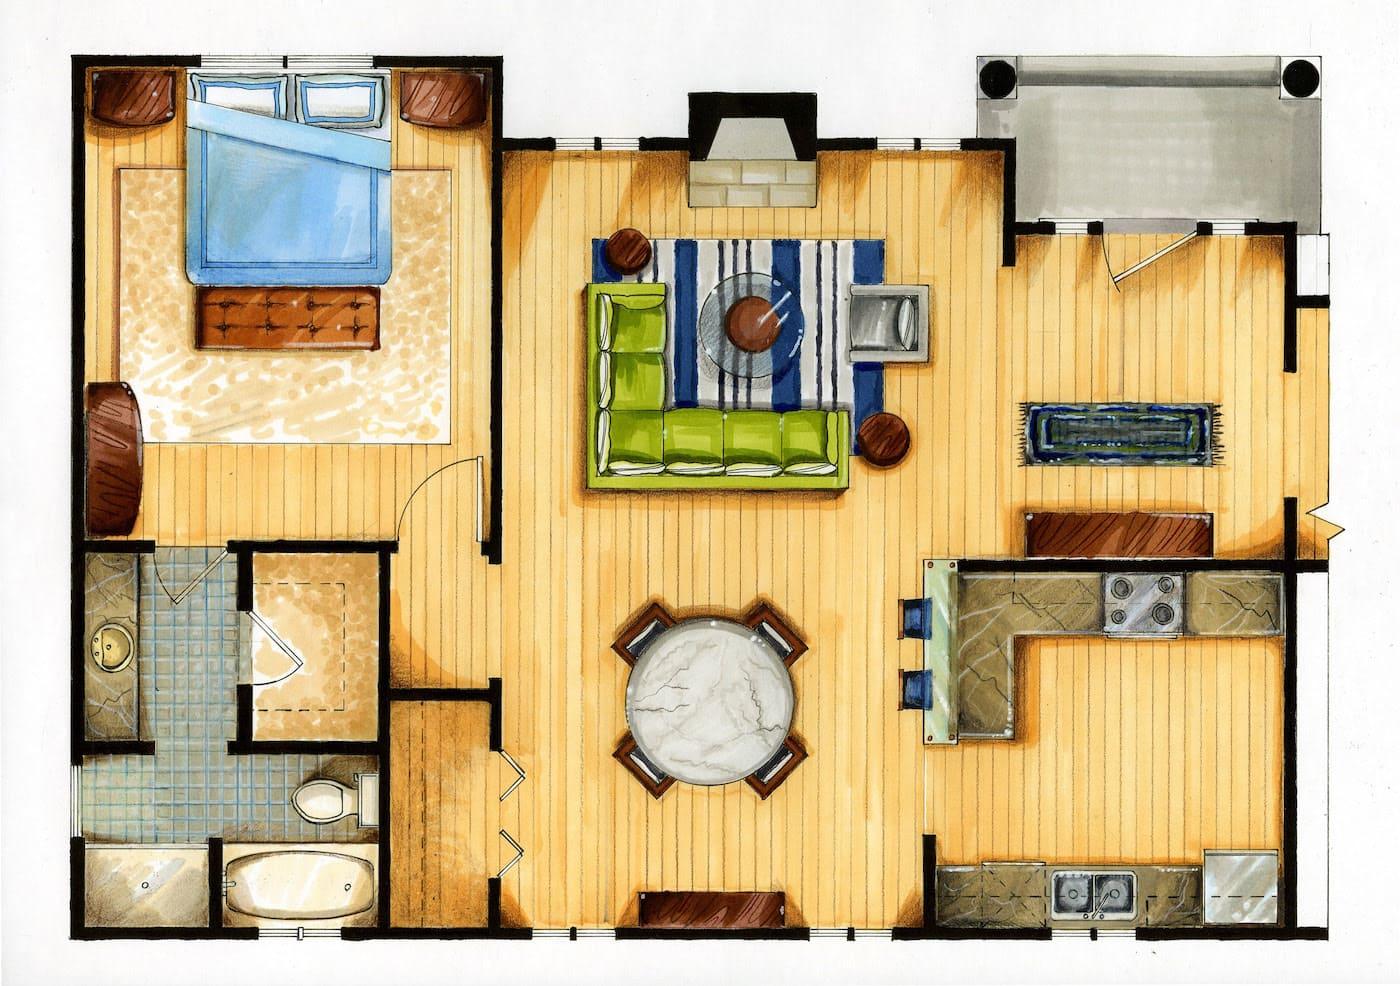 модный дизайн интерьера квартиры фото 62